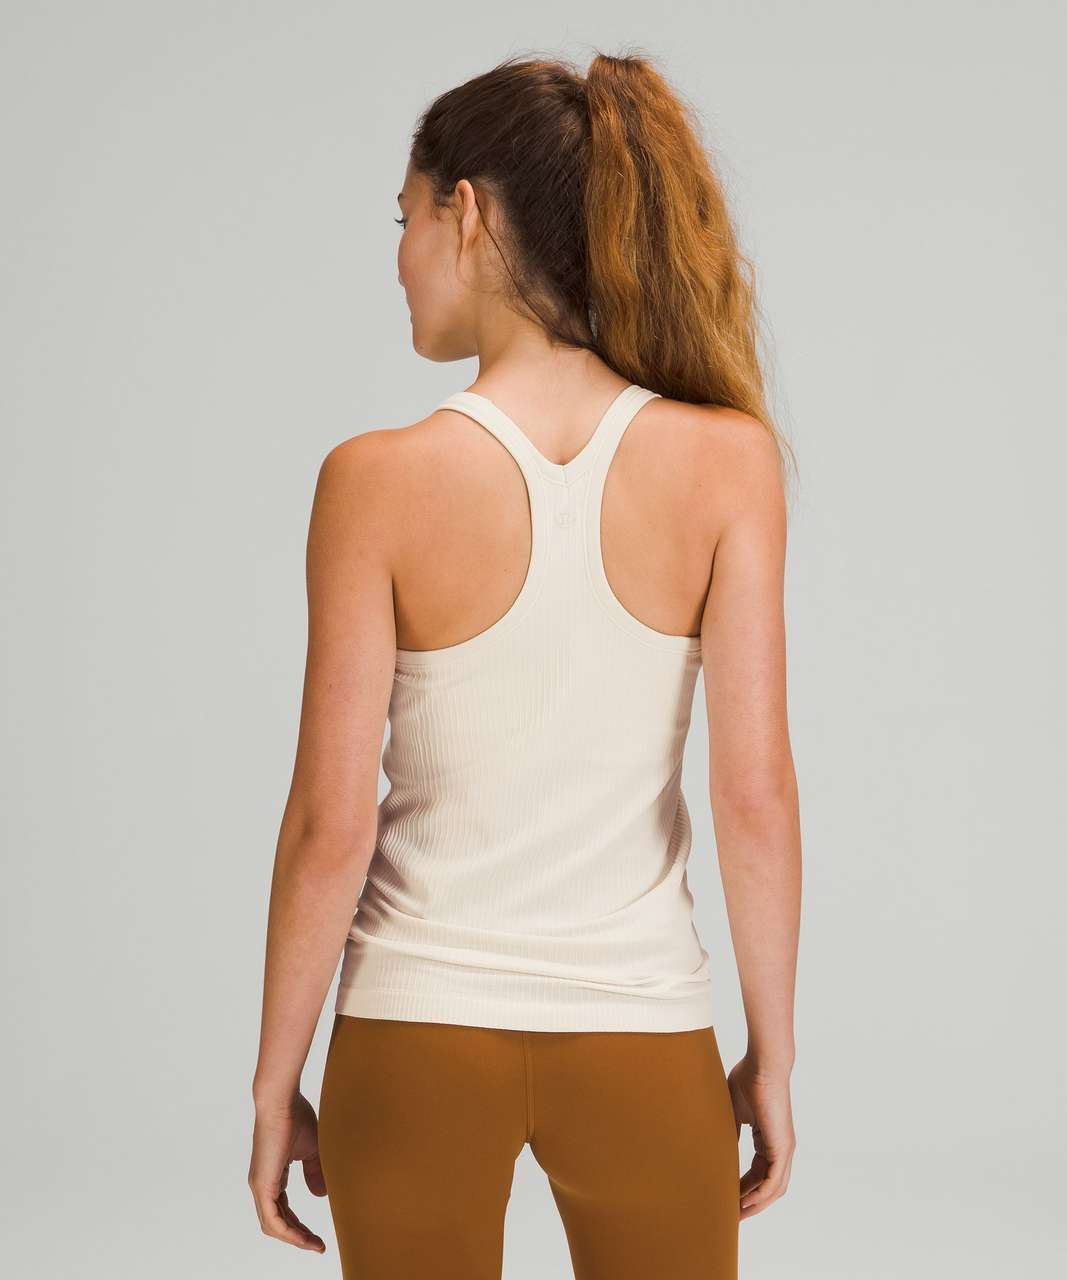 Lululemon Ebb to Street Shelf Bra Tank Top *Light Support - White Opal